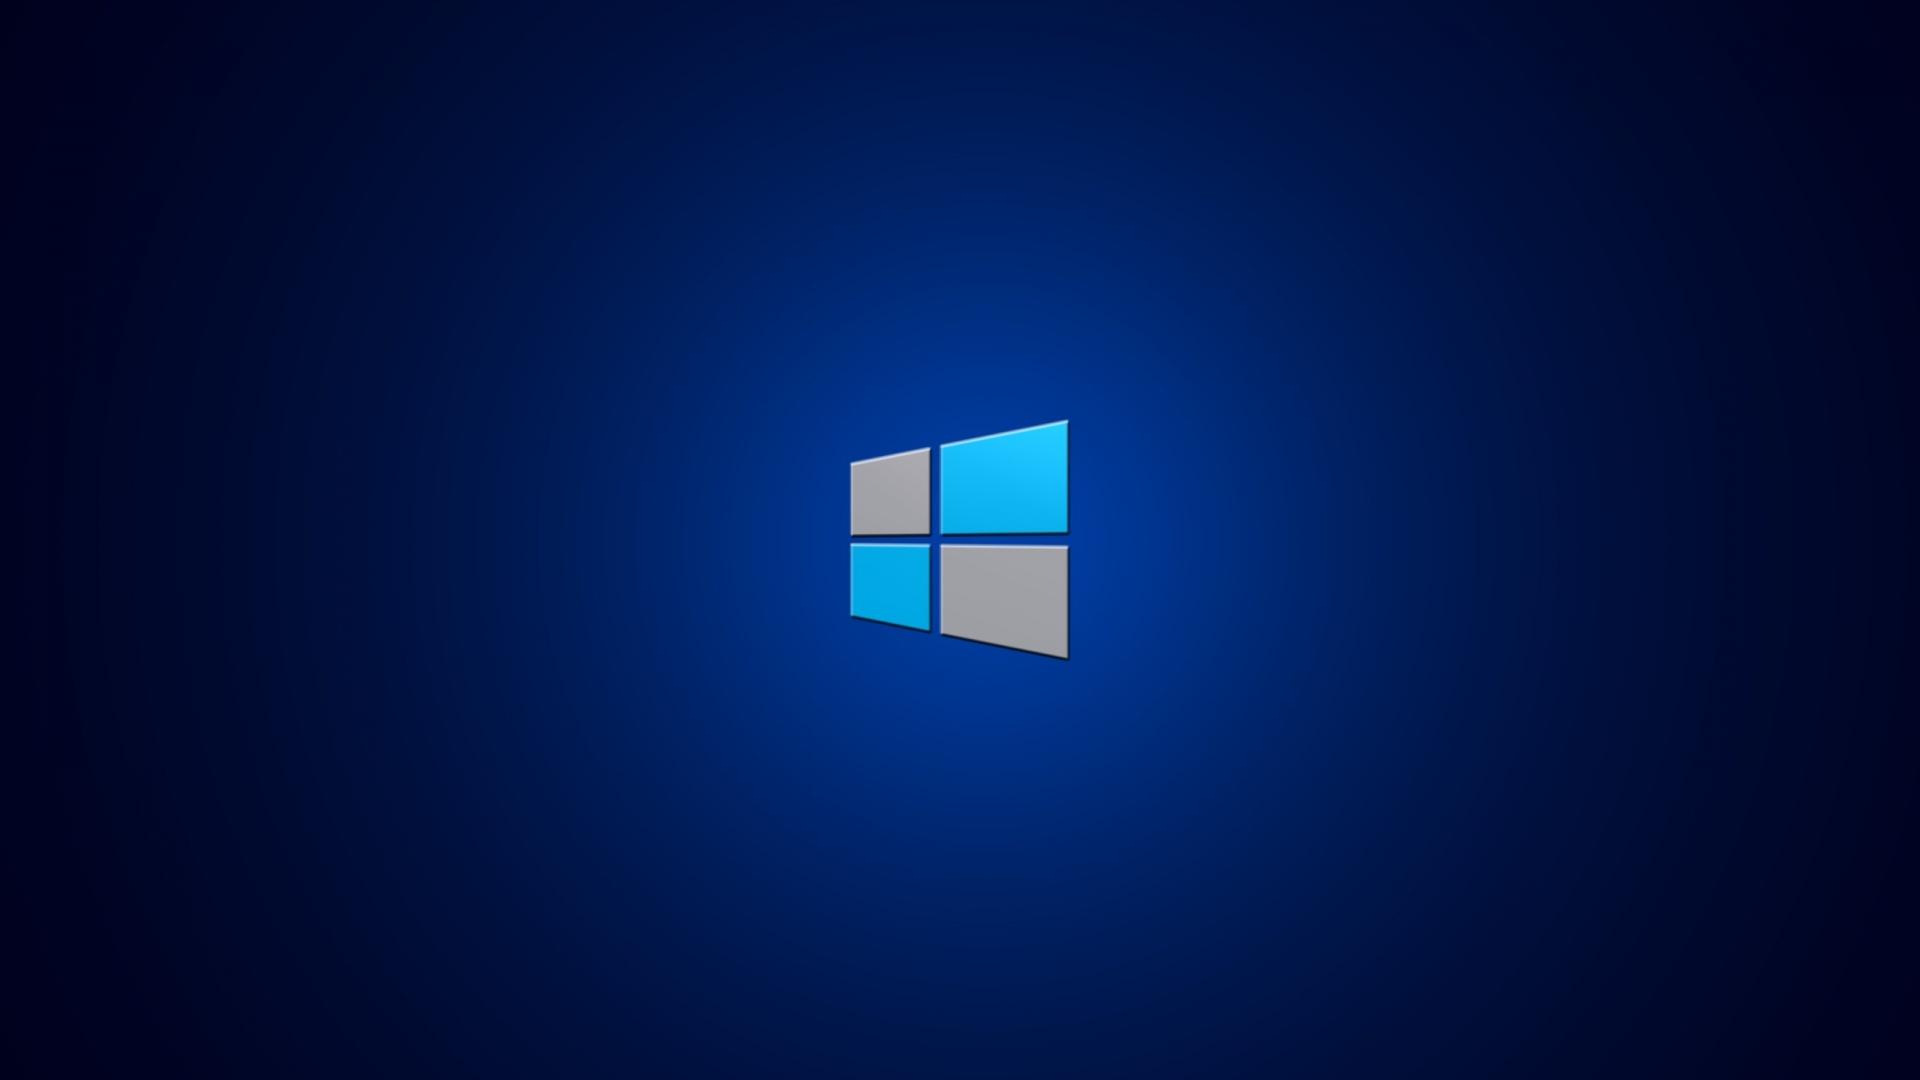 20 Widescreen HD Wallpapers For Windows 8 Desktop Background